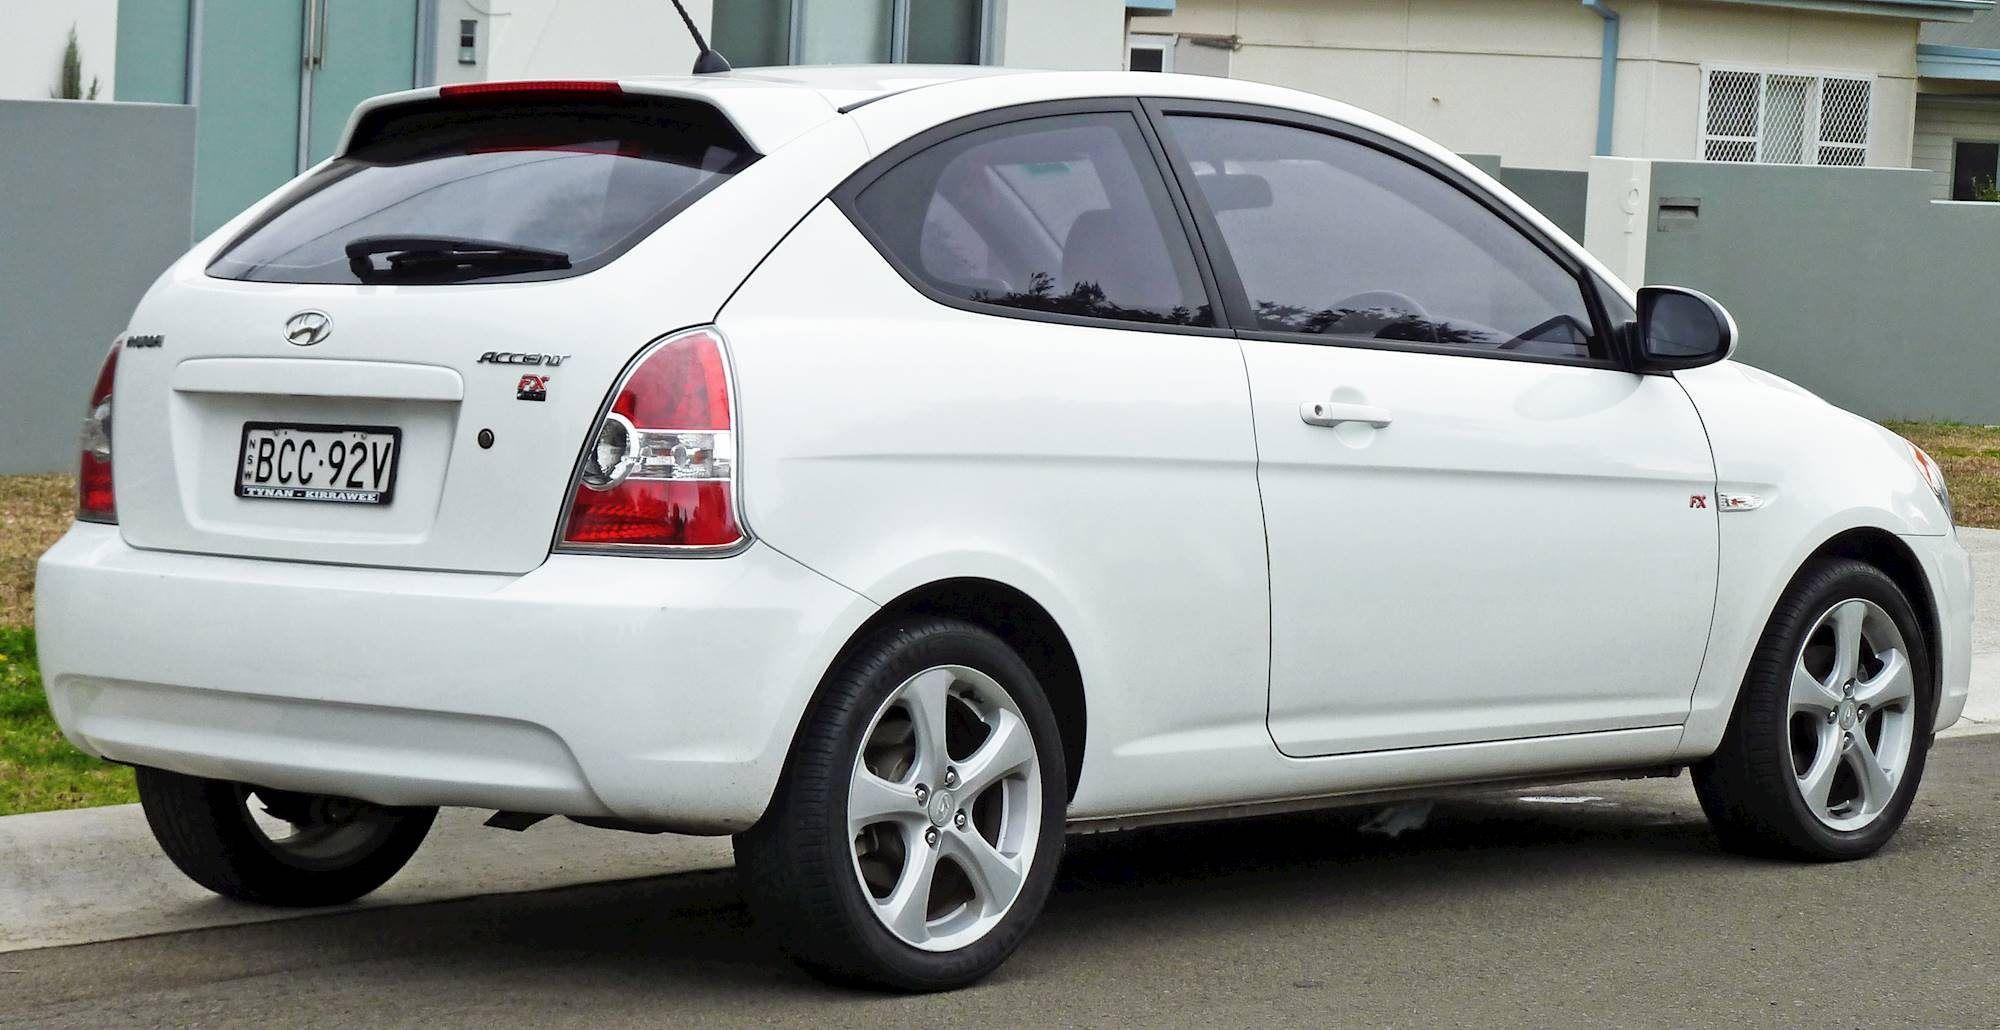 2021 Hyundai Accent Hatchback Picture